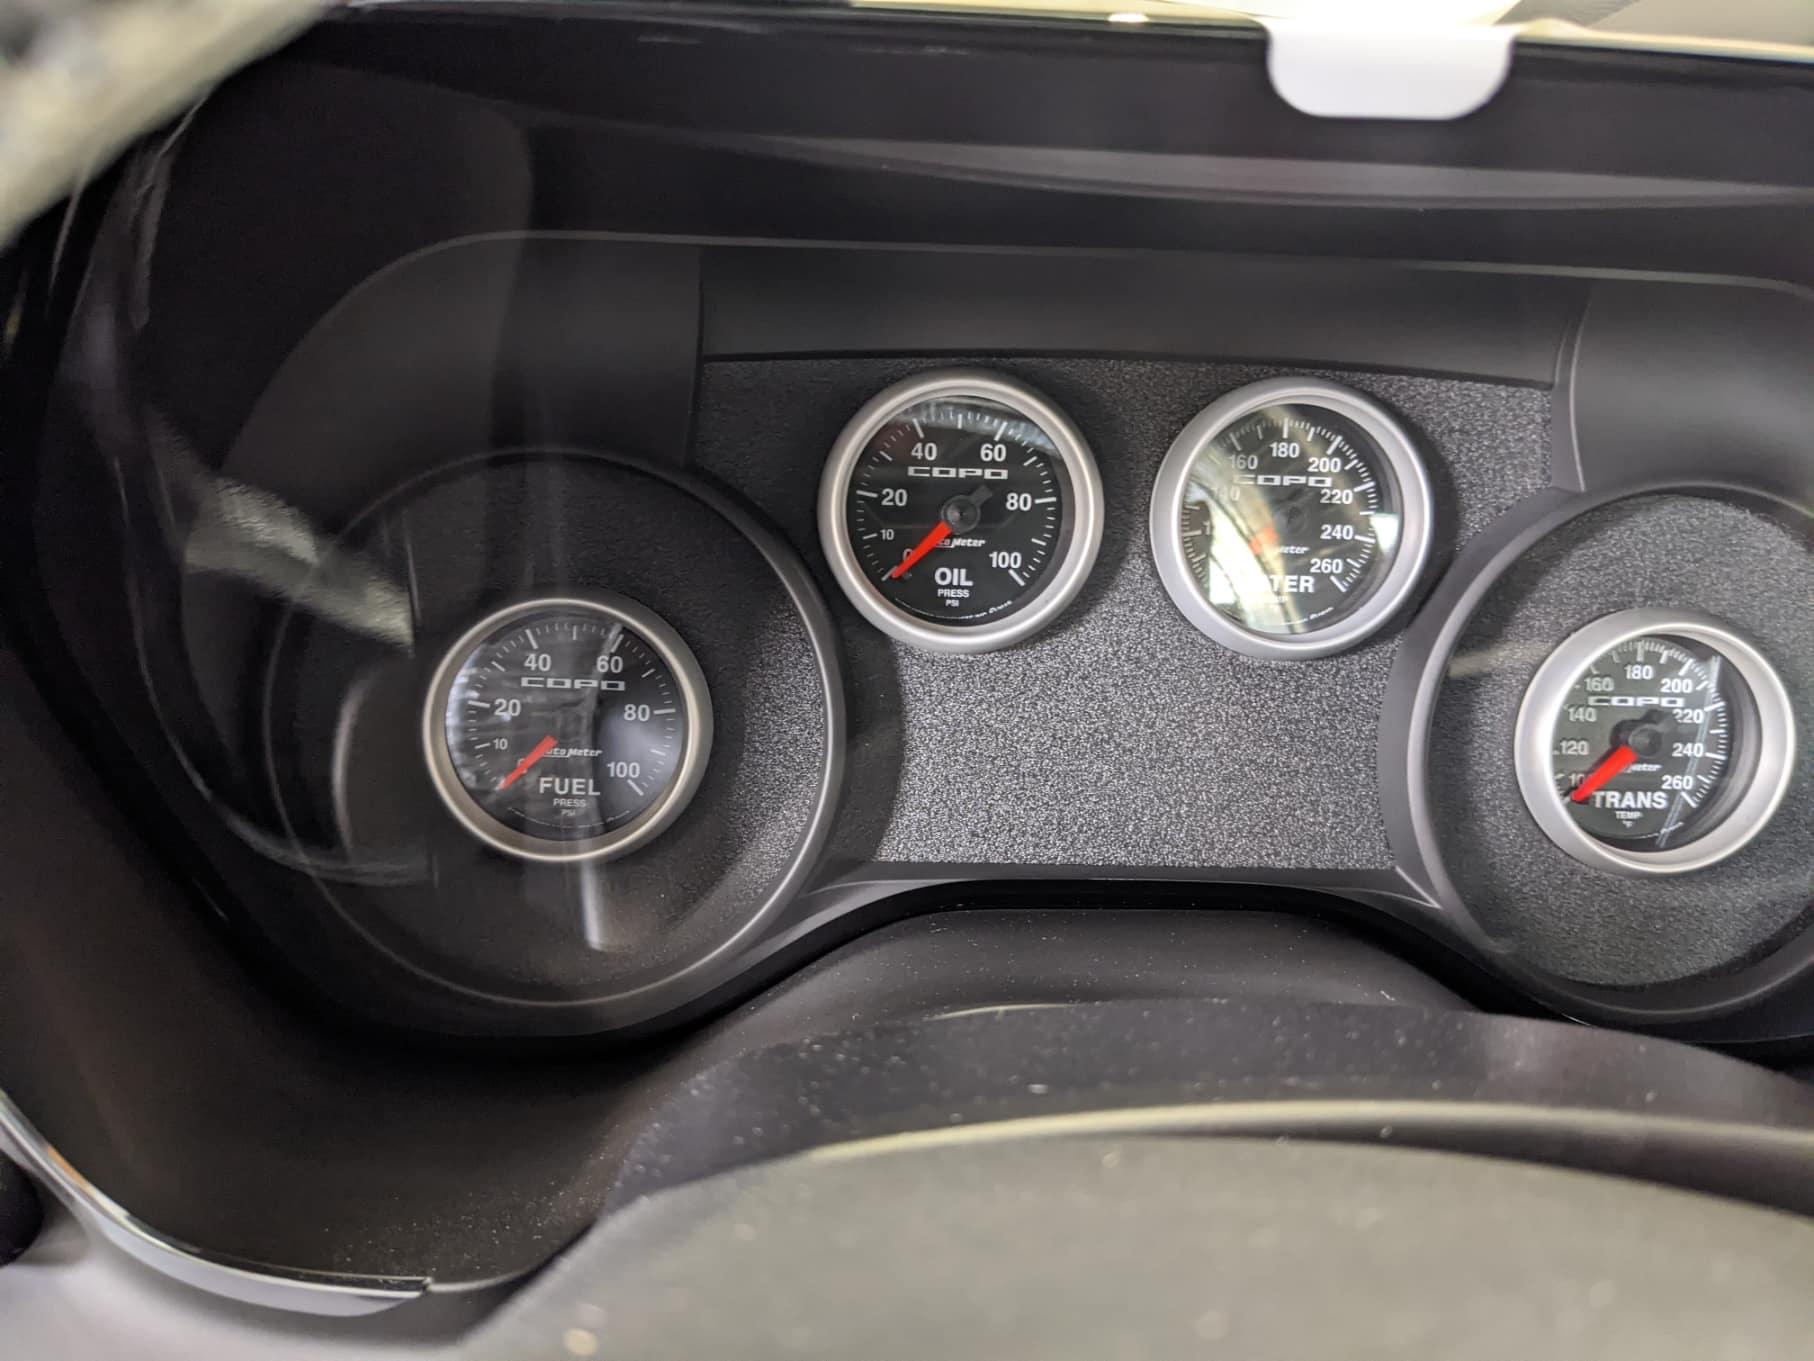 2020 Chevy Copo Camaro Interior